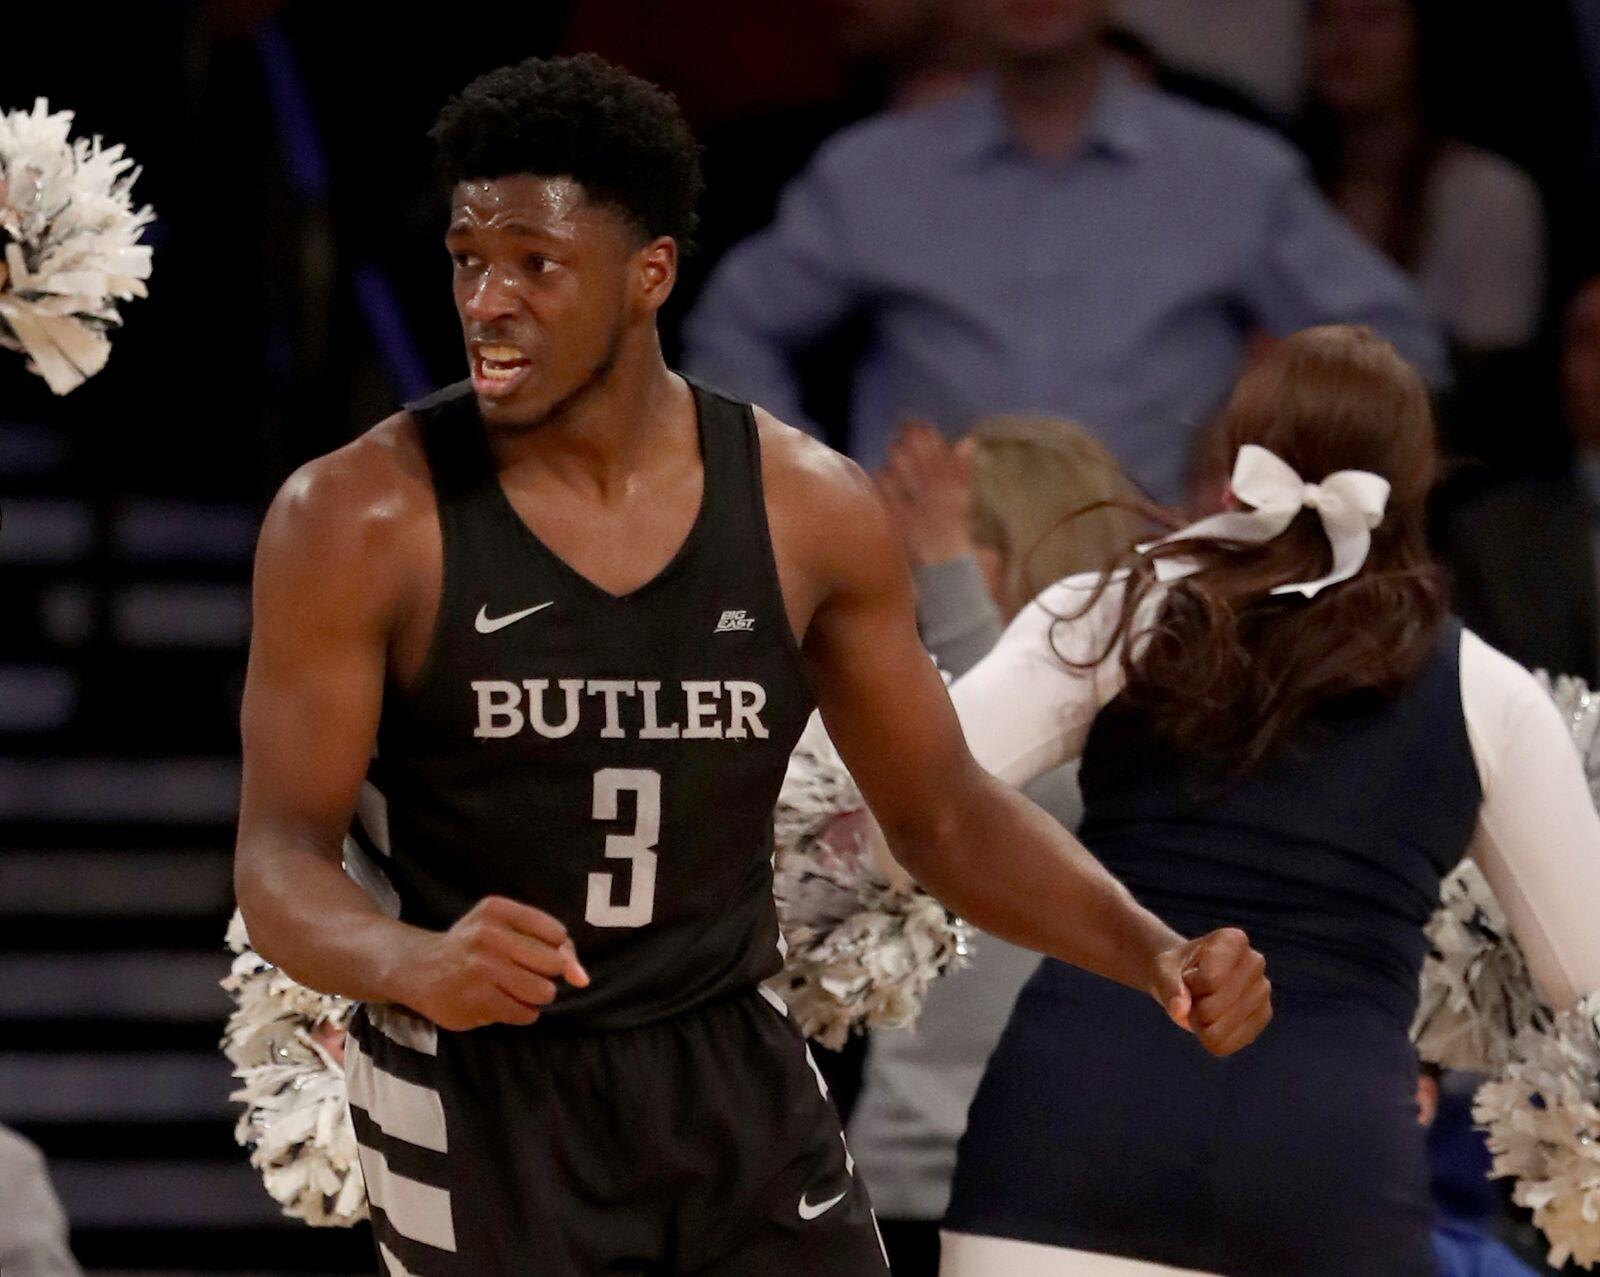 Syracuse Basketball: Khalif Battle commits to Butler